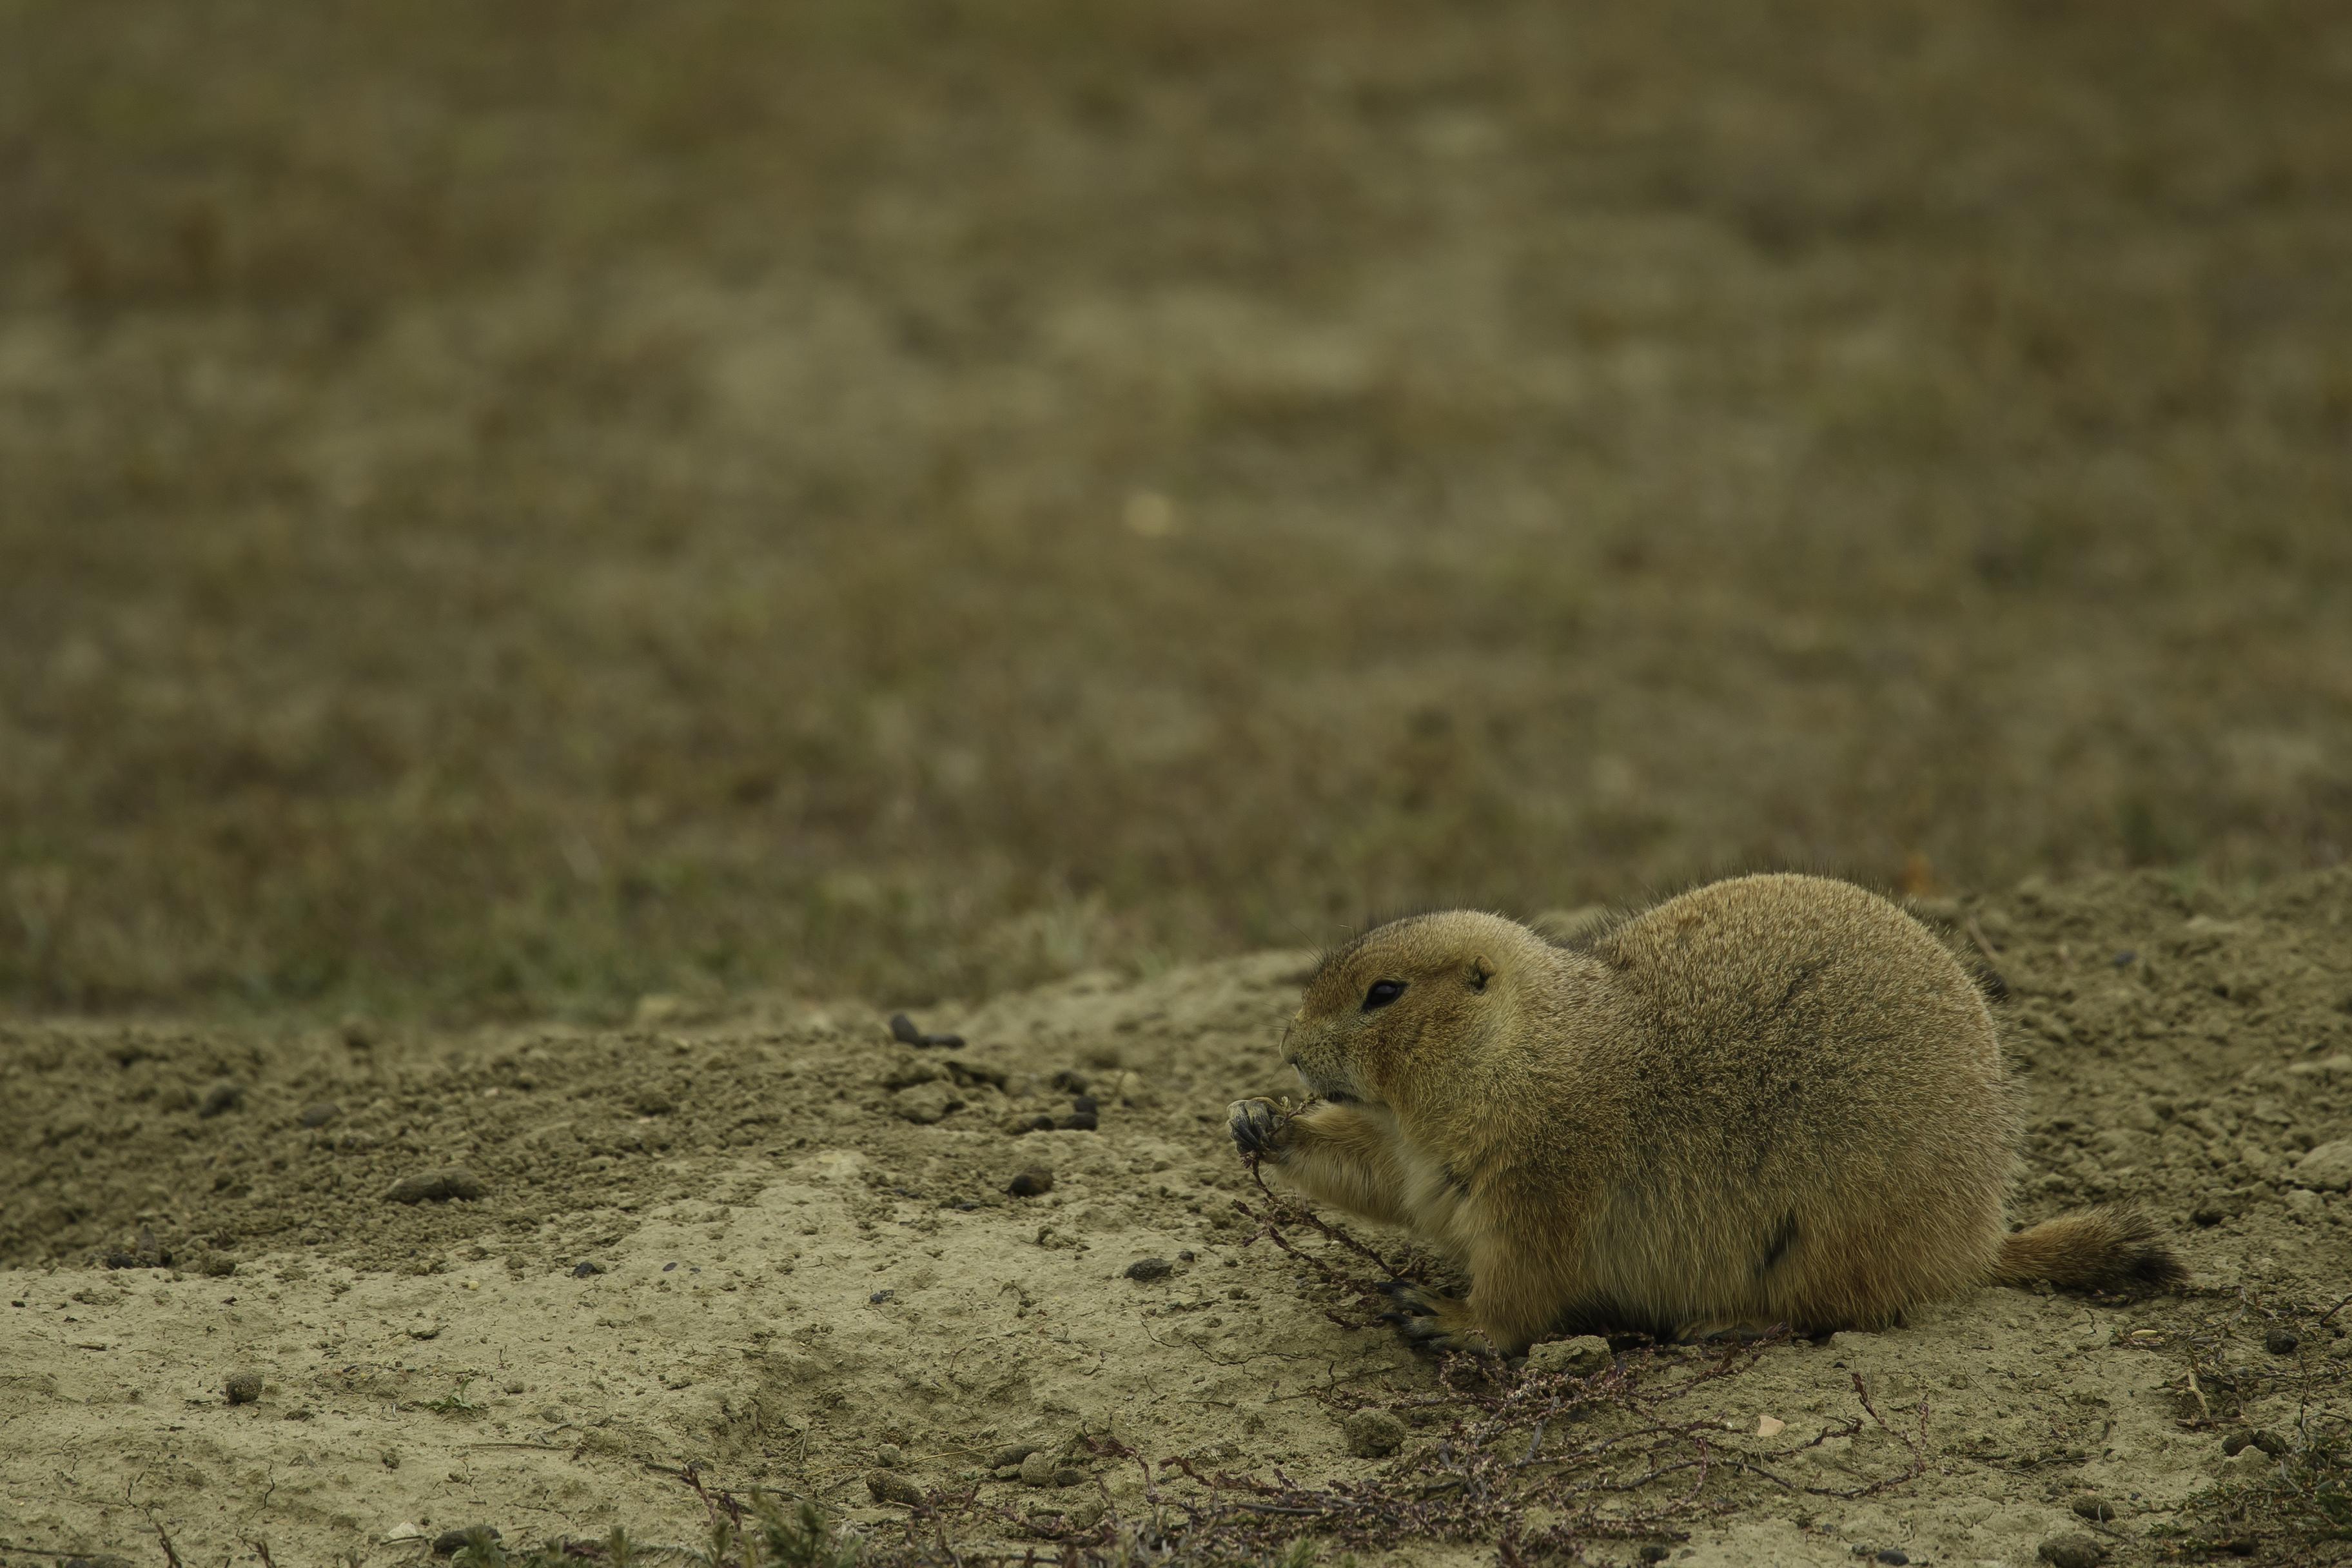 Roos. Natl Park Day 3- 2485-1.jpg